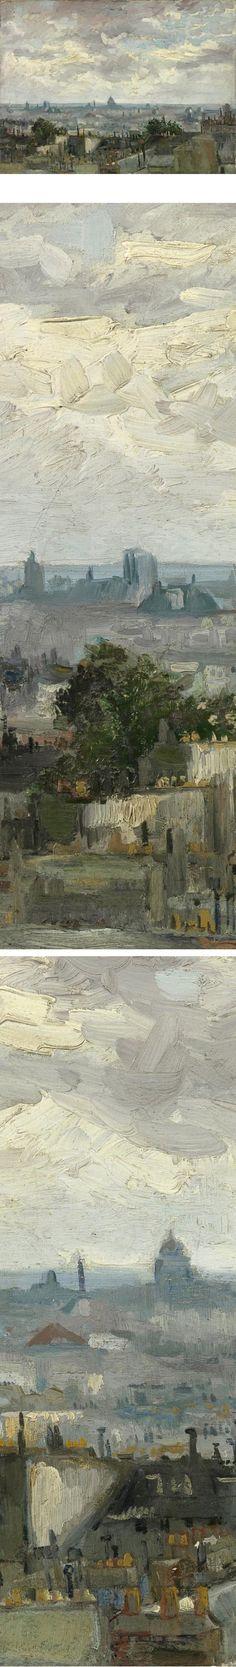 View of Paris, Vincent van Gogh.  From the Van Gogh Museum